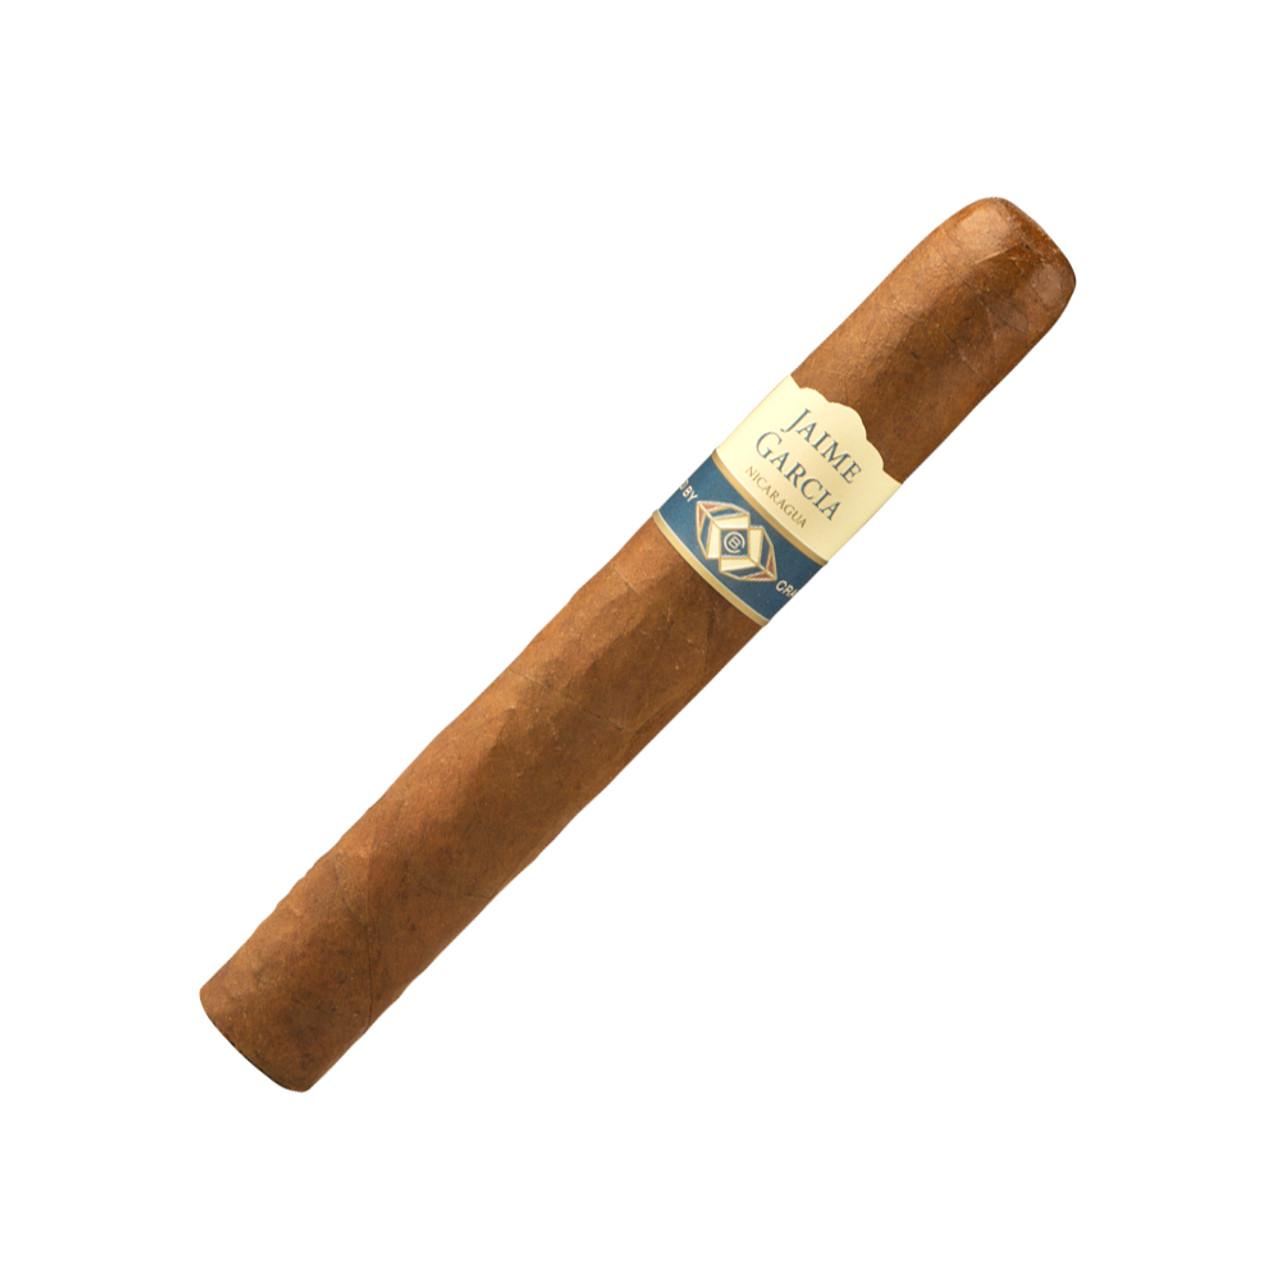 Crafted by Jaime Garcia Toro Gordo Cigars - 6 x 60 (Box of 10)